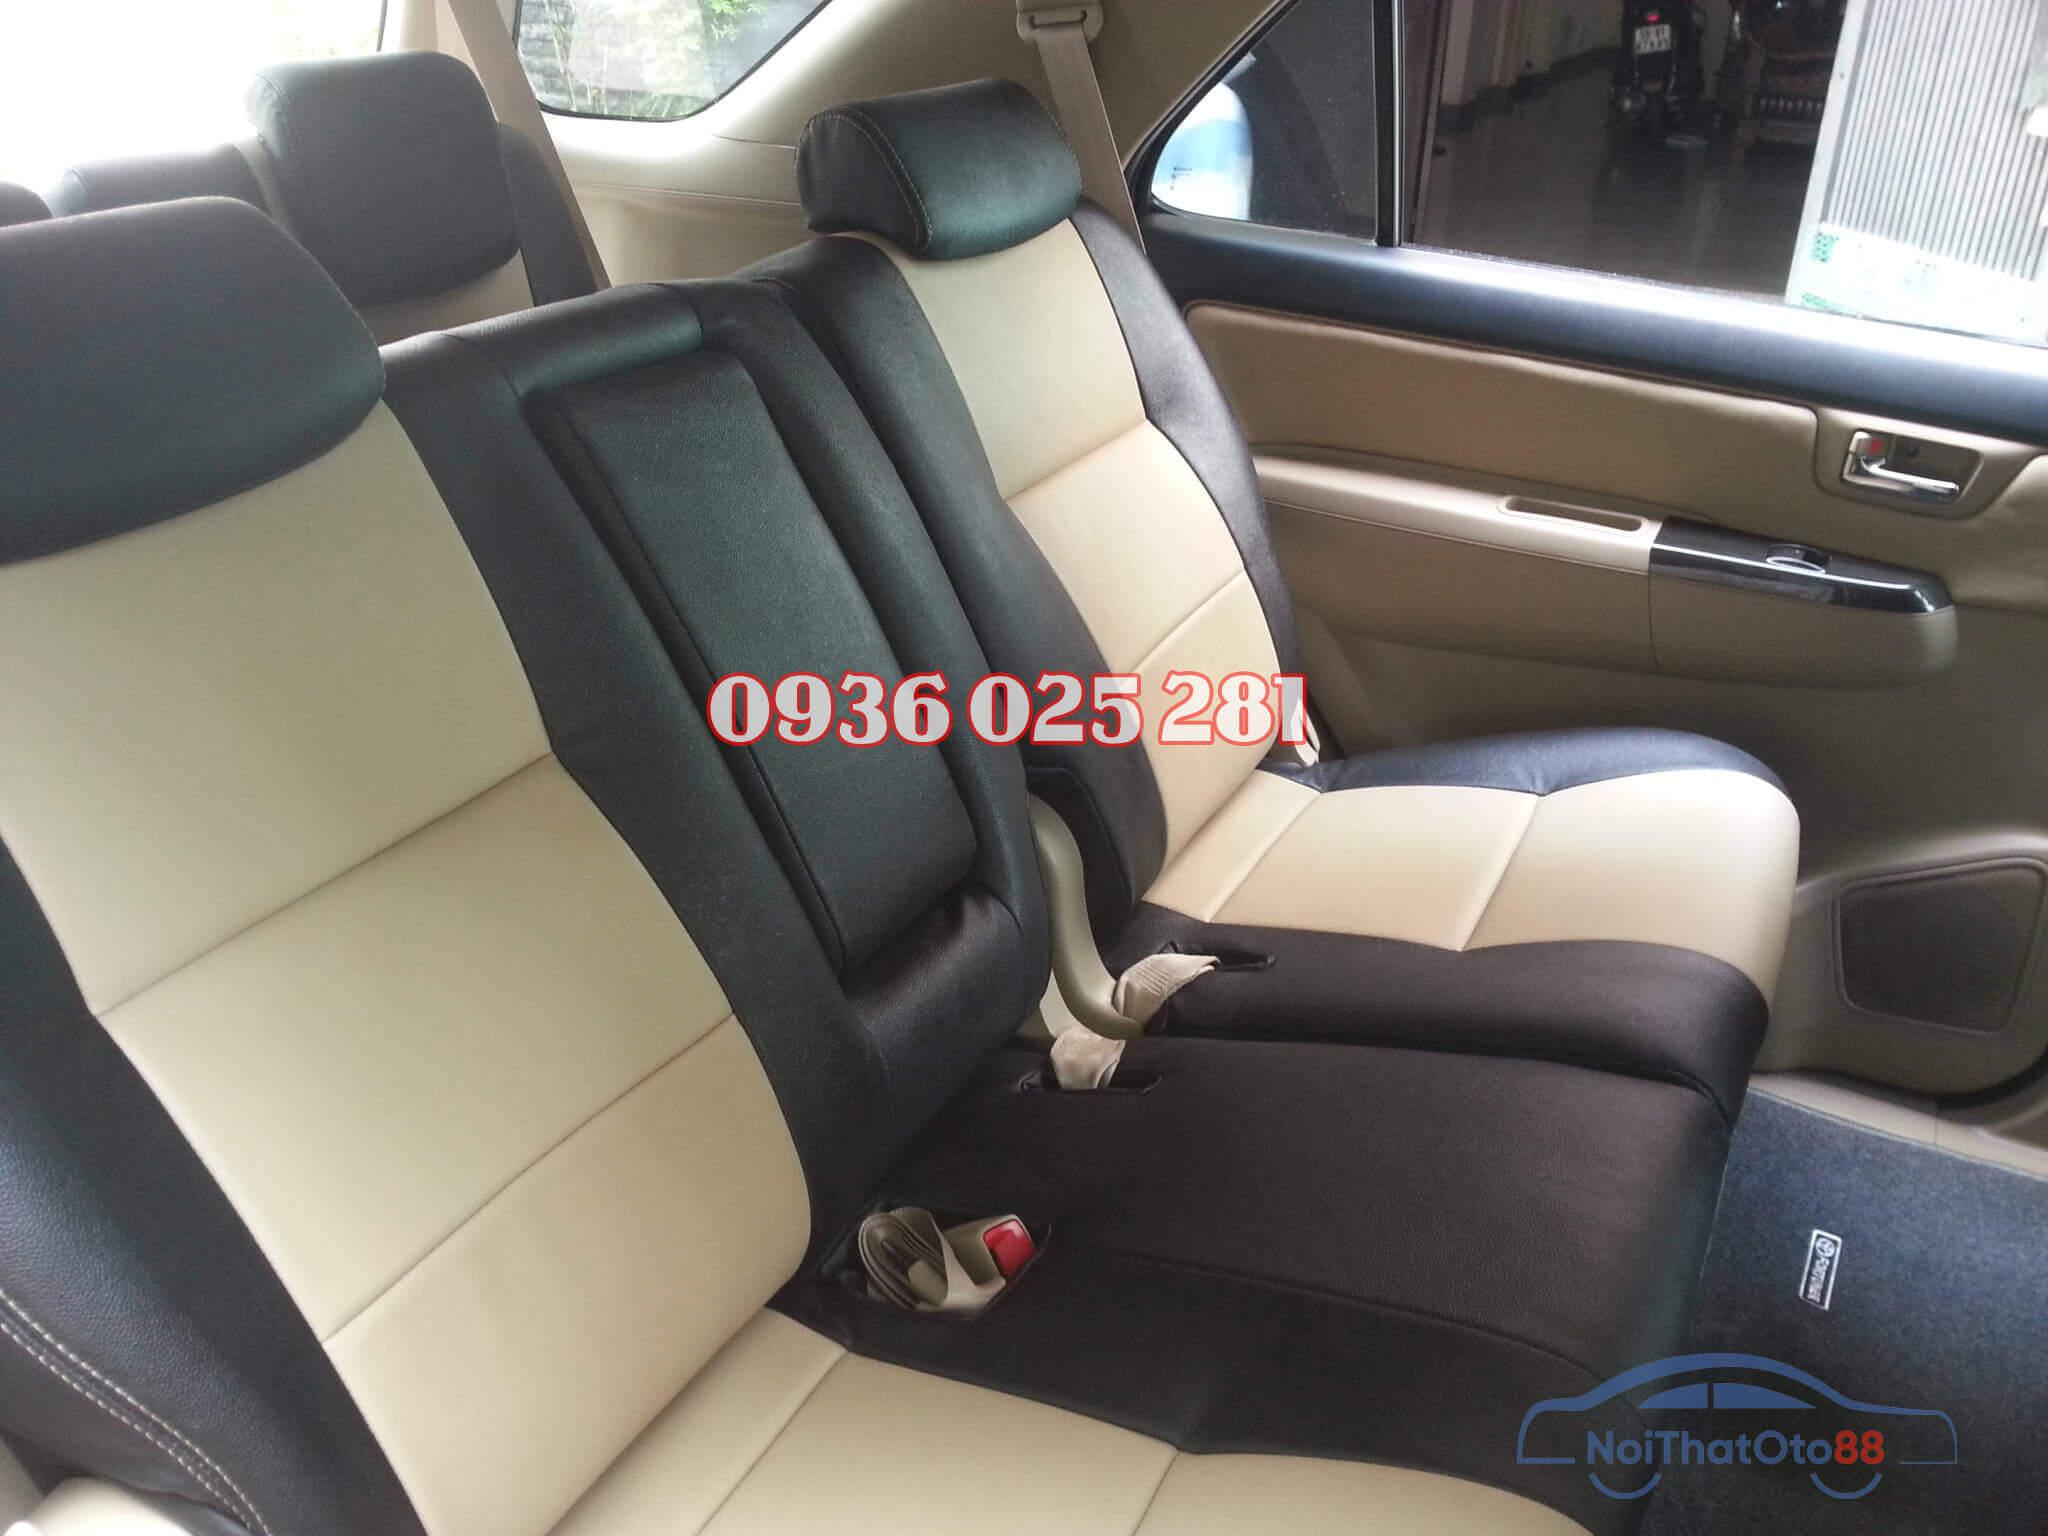 Bọc ghế da cho xe Toyota Fortuner